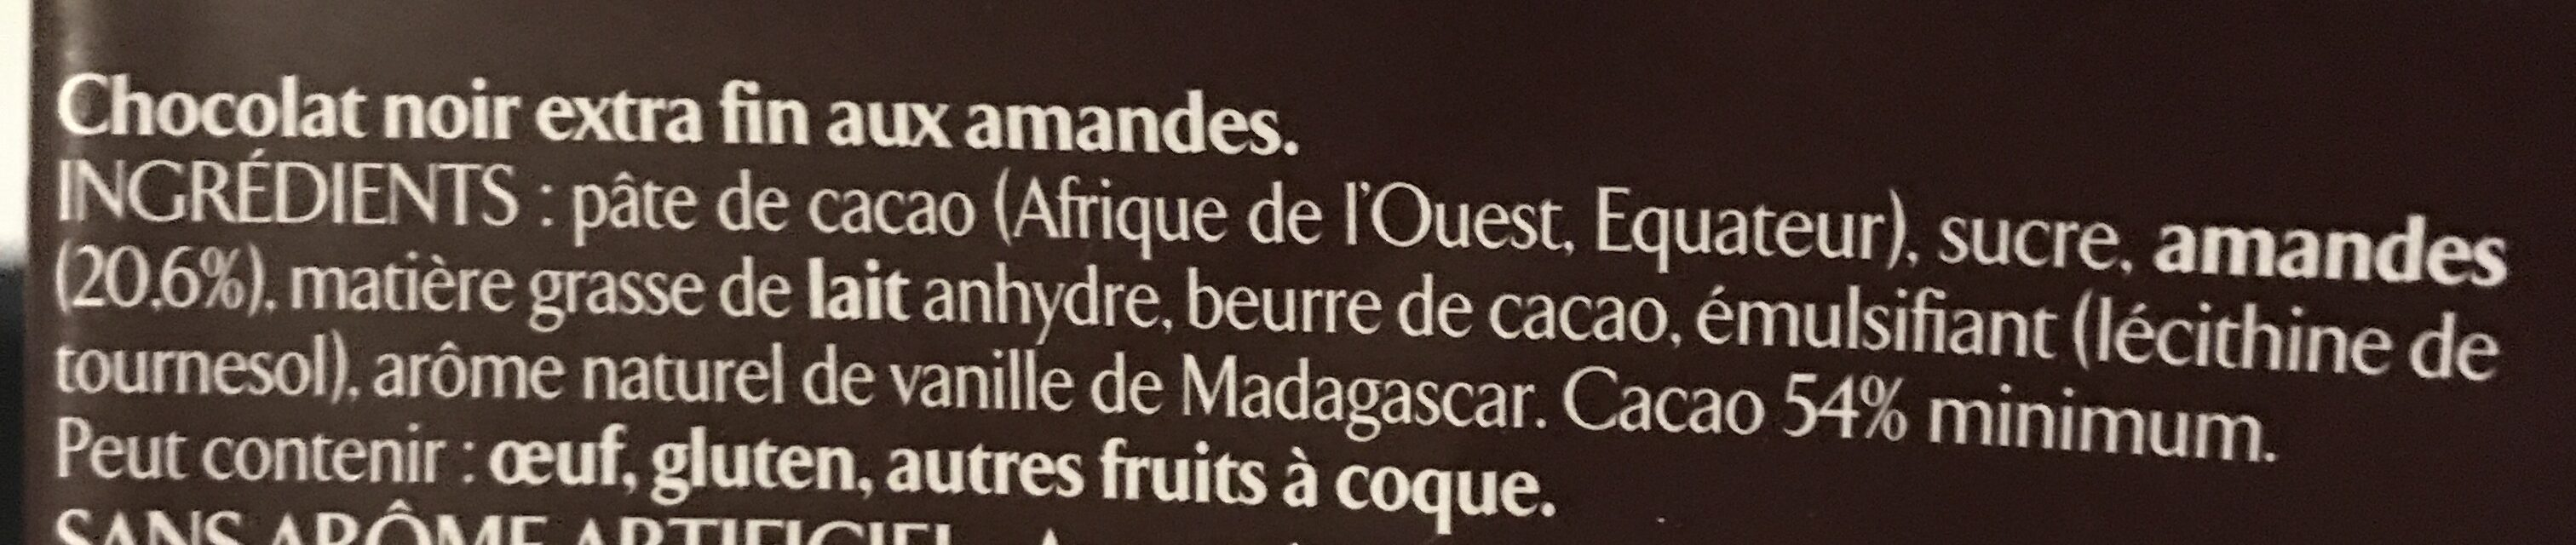 Amandes entières chocolat noir - Ingredients - fr